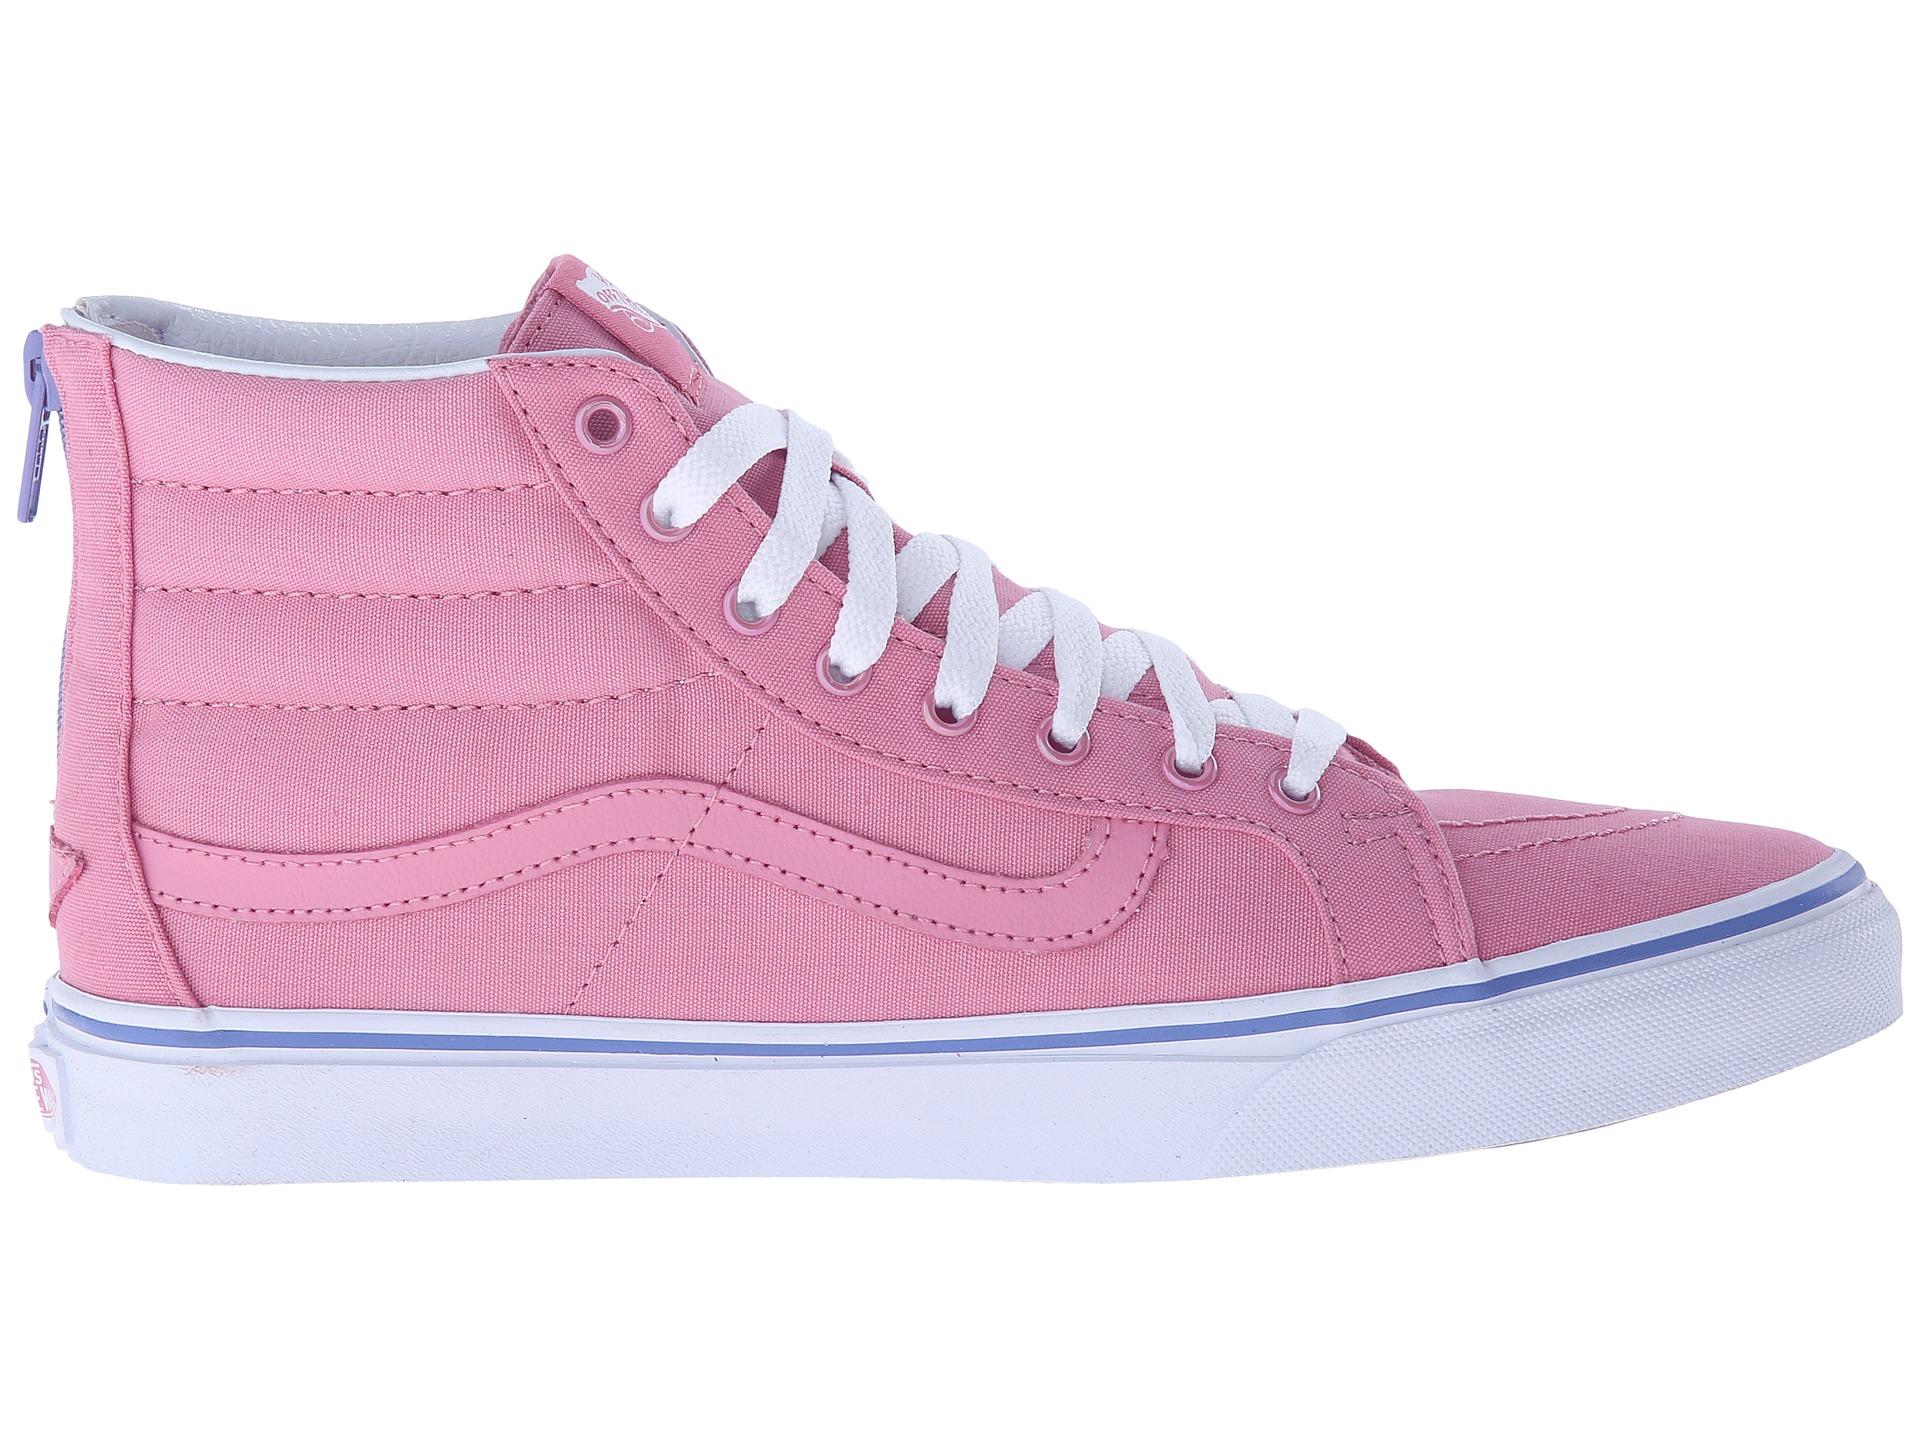 057d327790769b Lyst - Vans Sk8-hi Slim Zip in Pink